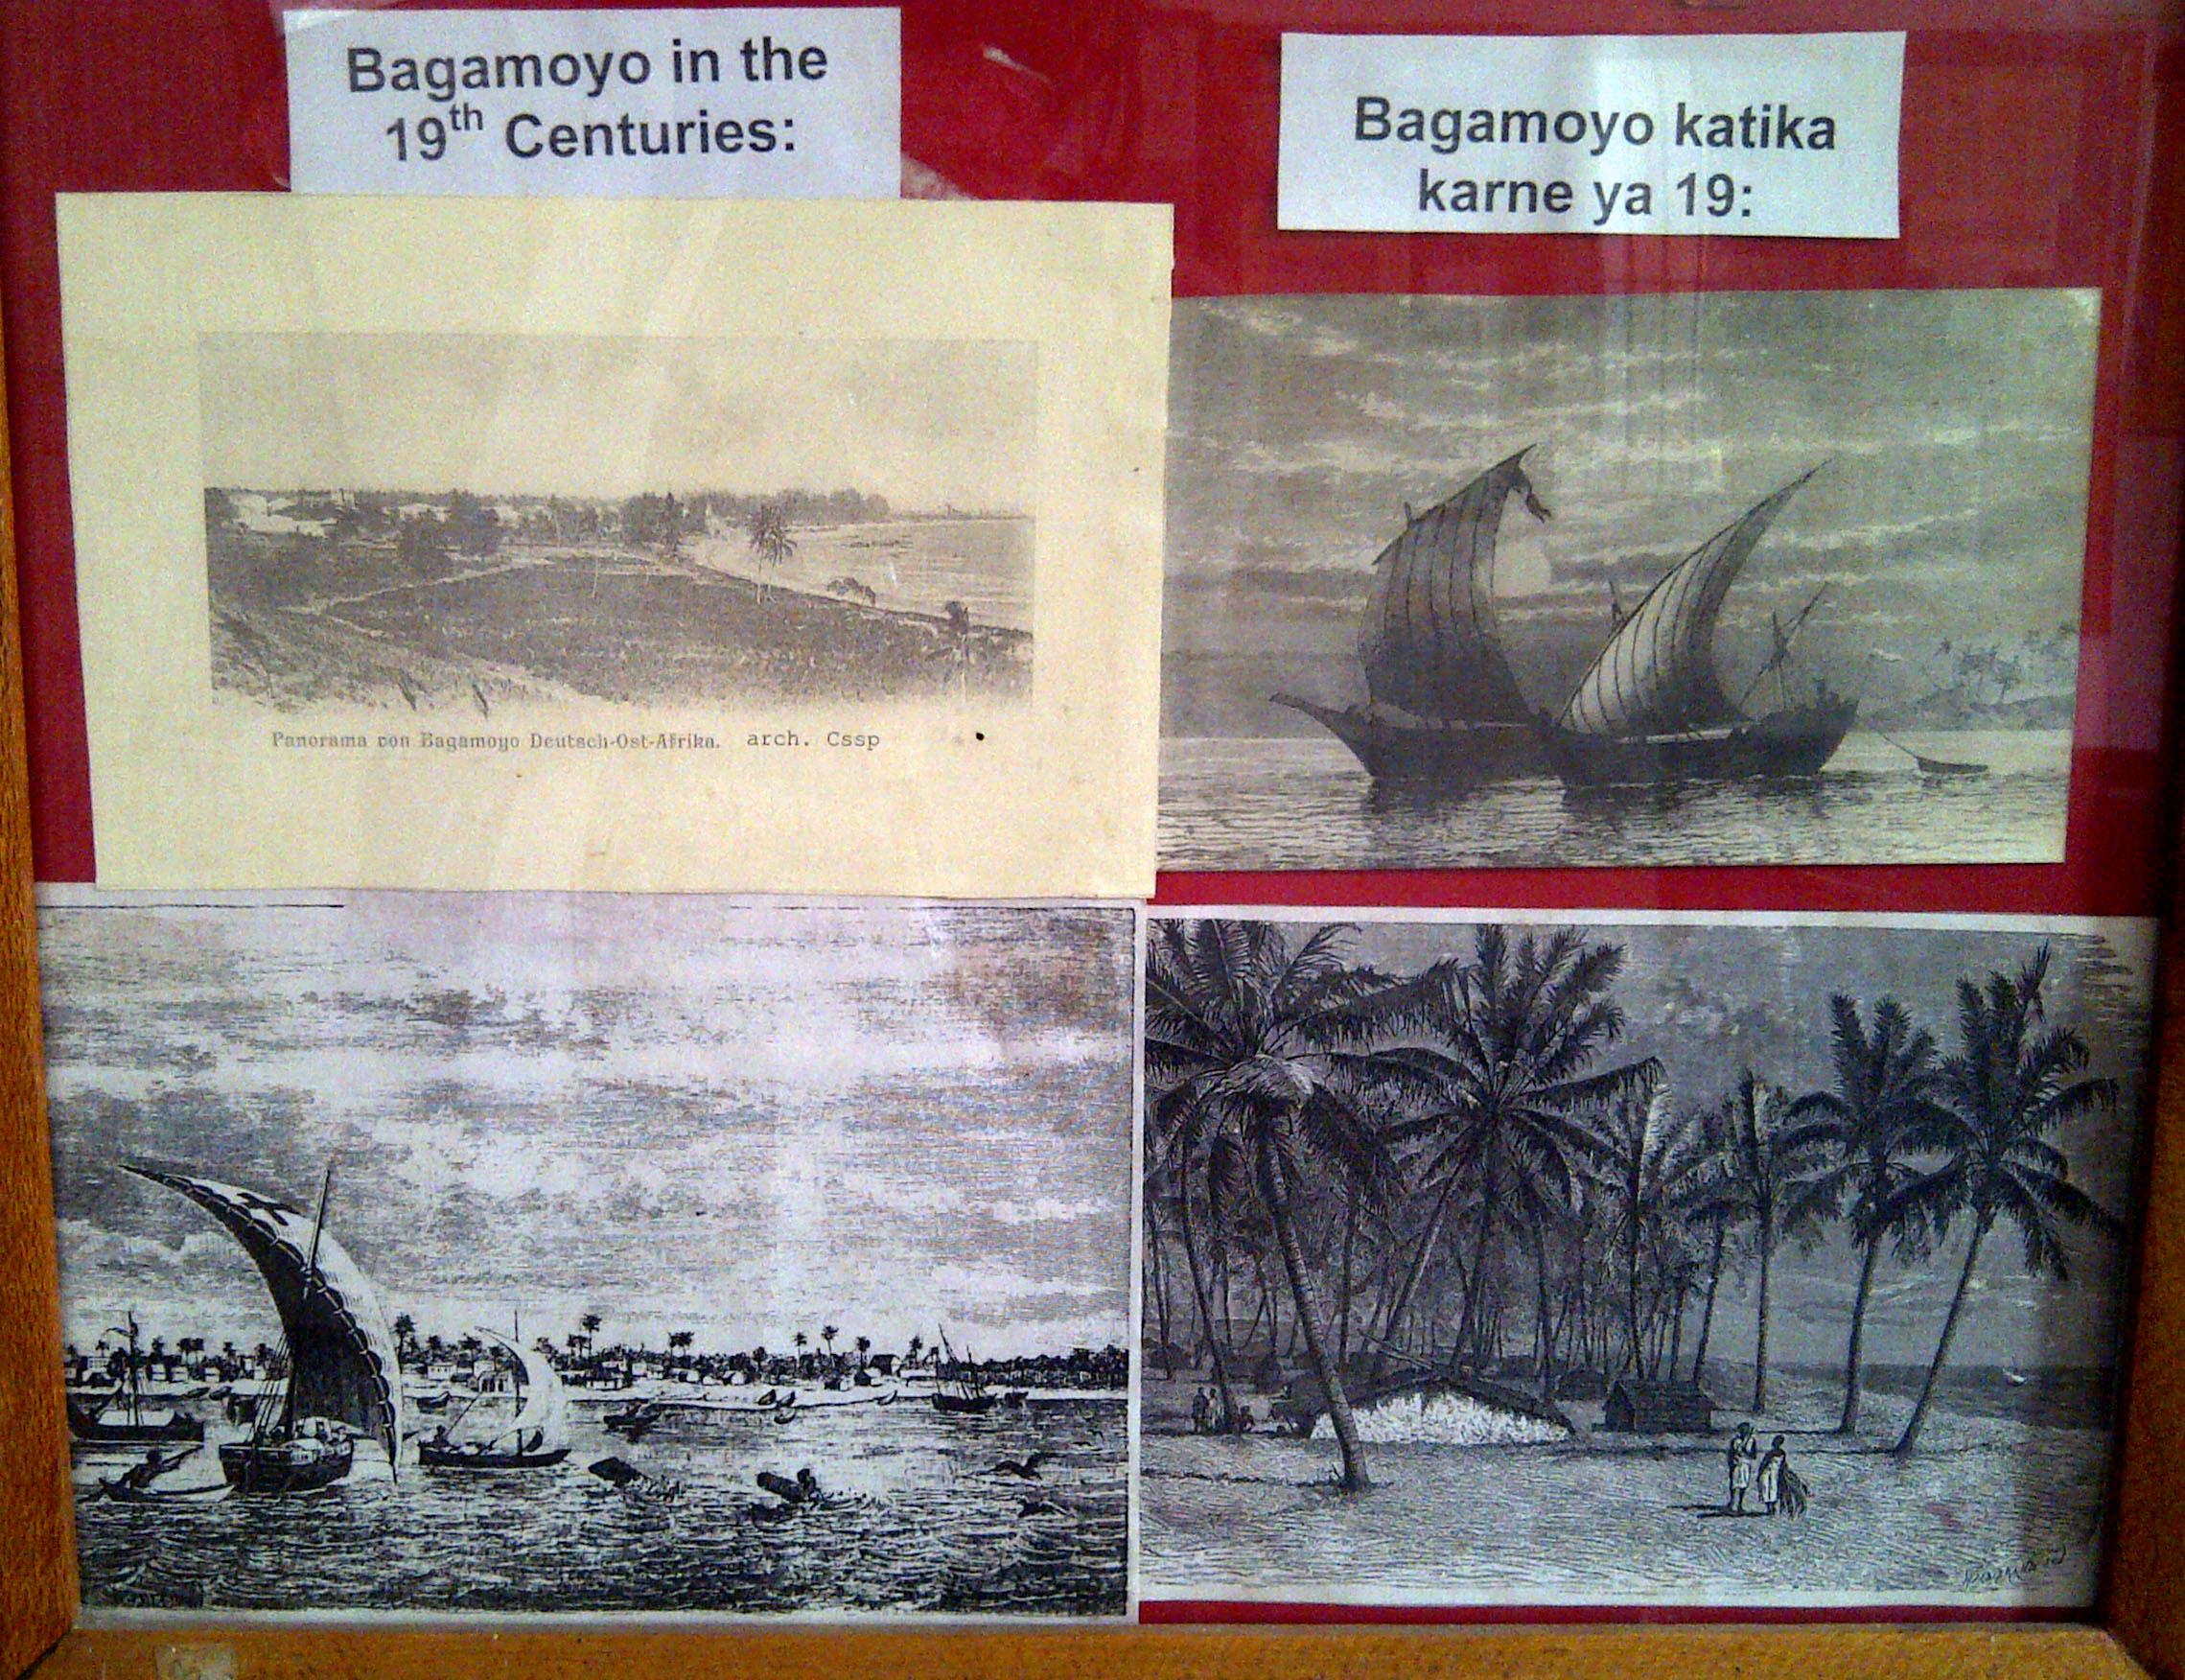 Bagamoyo c. 19th century